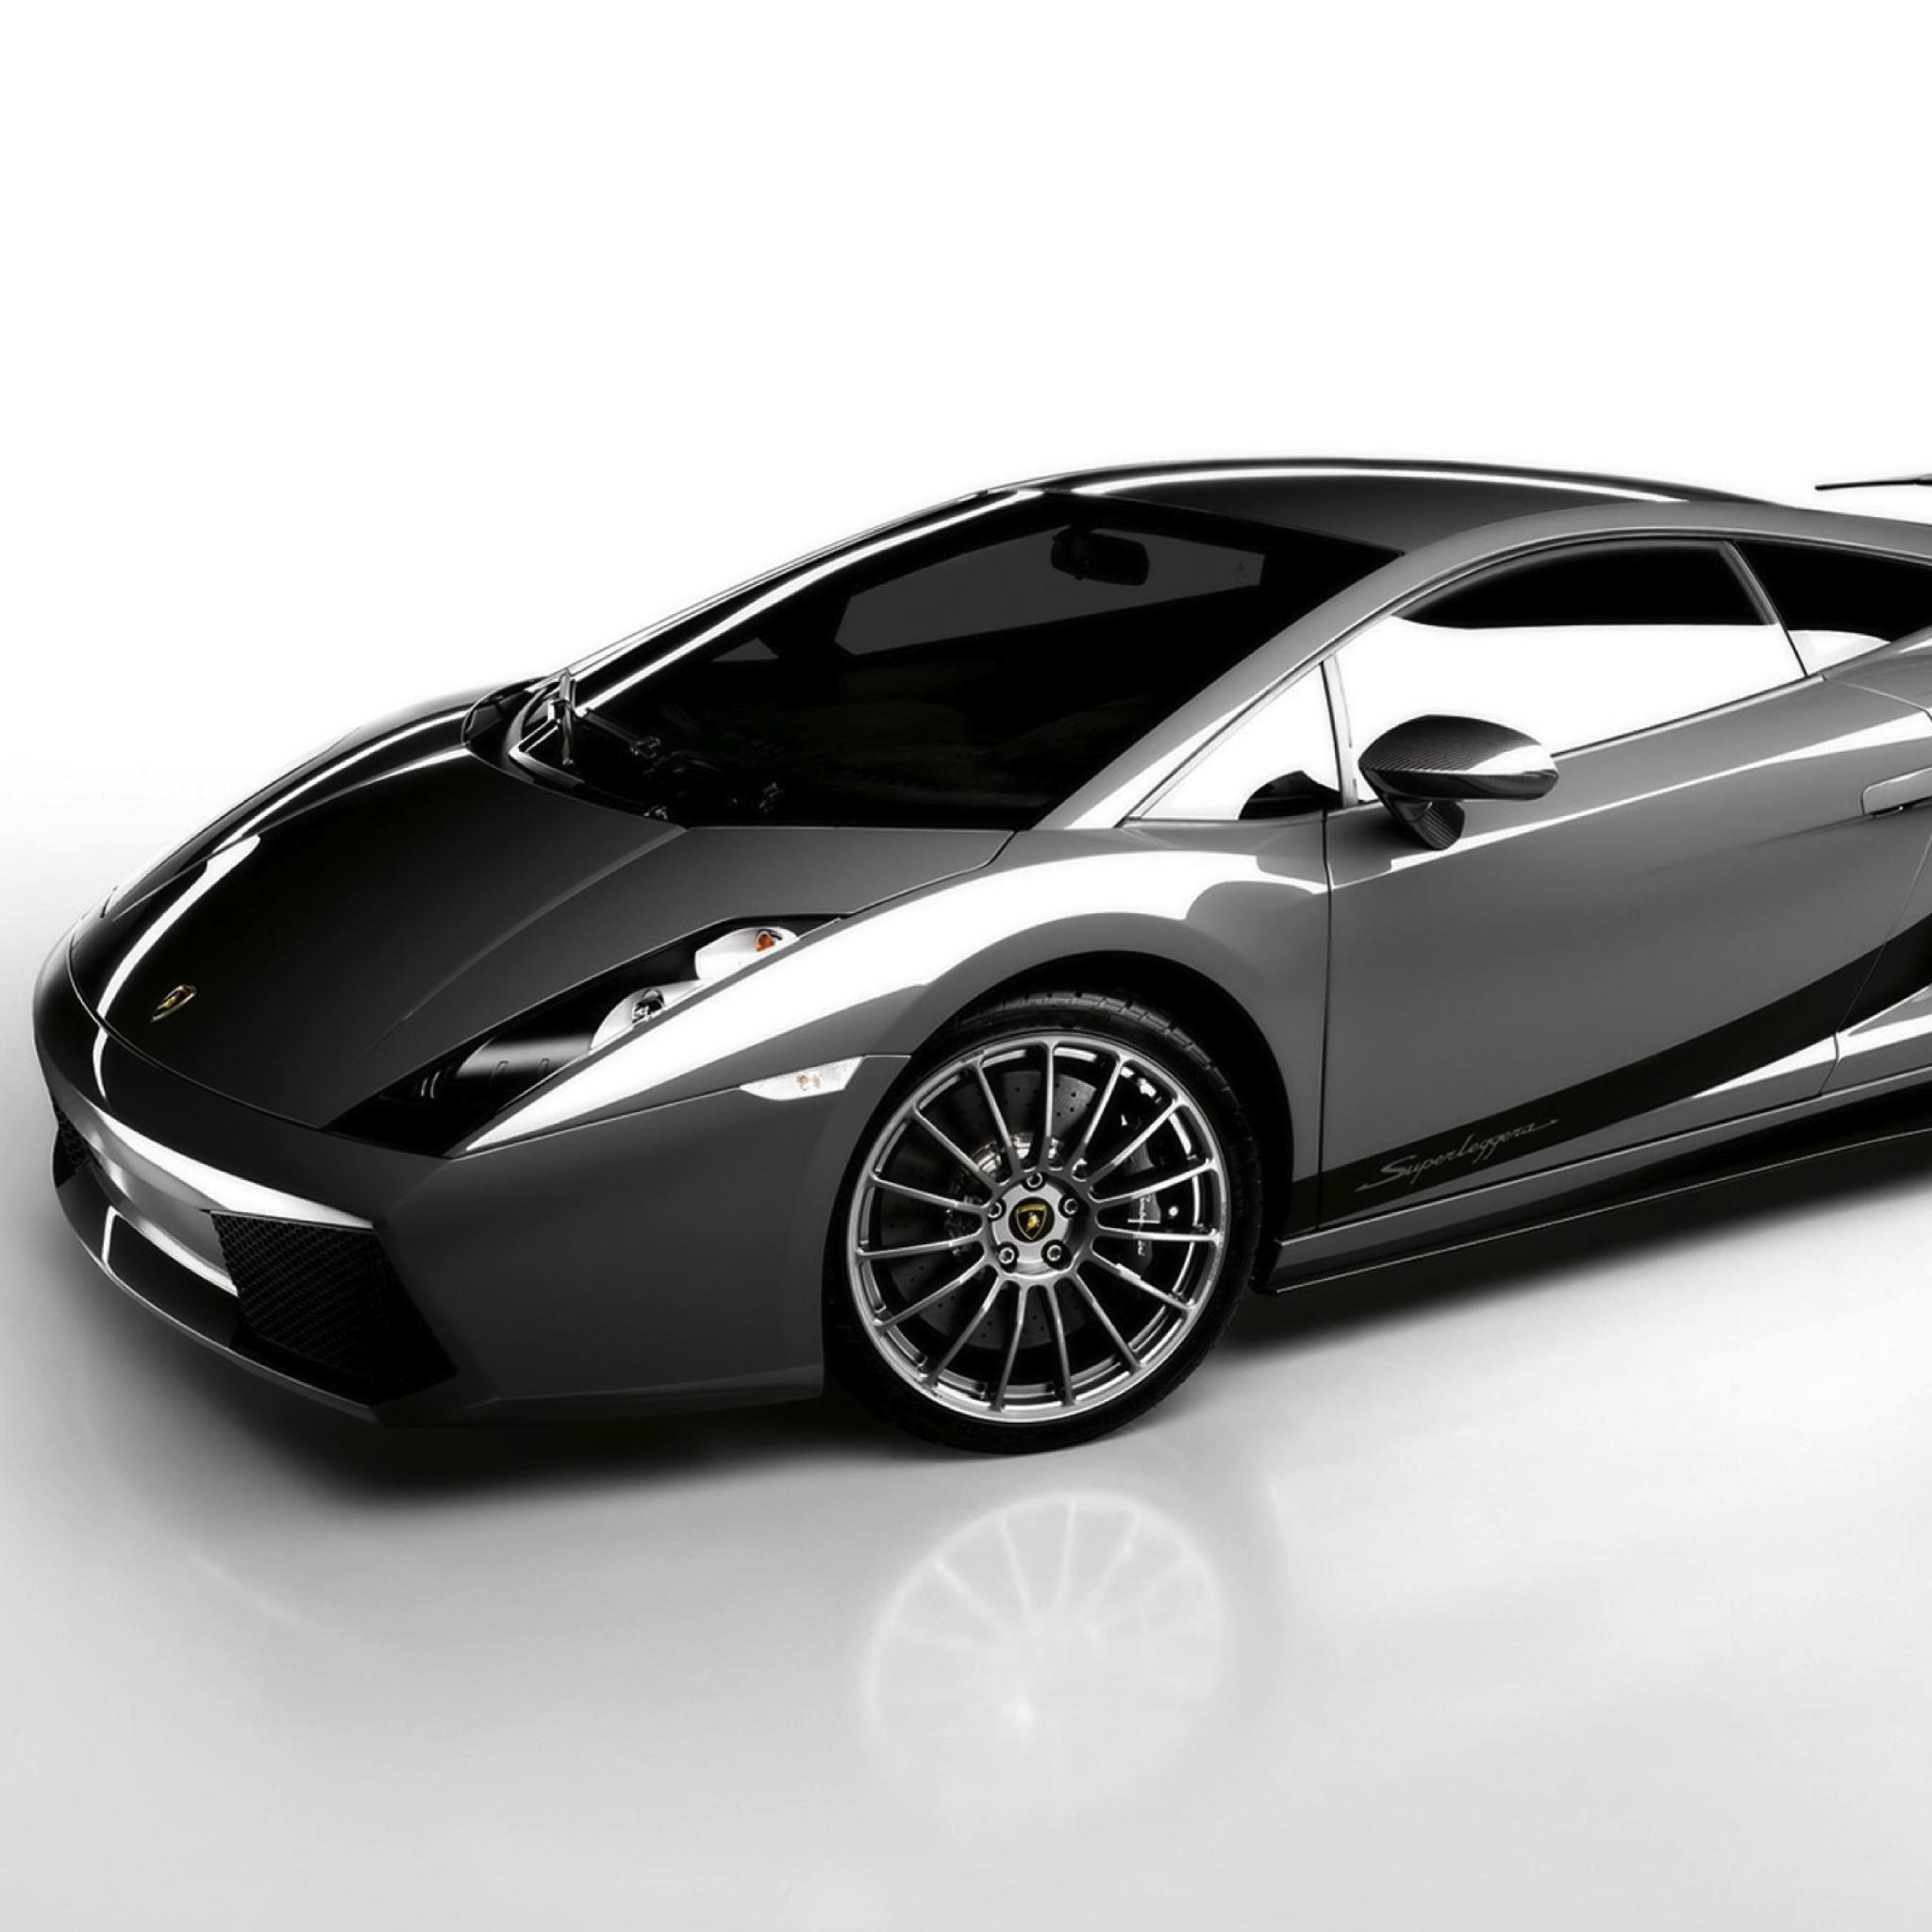 Lamborghini Gallardo 3W iPad.jpg  Lamborghini Gallardo   iPad